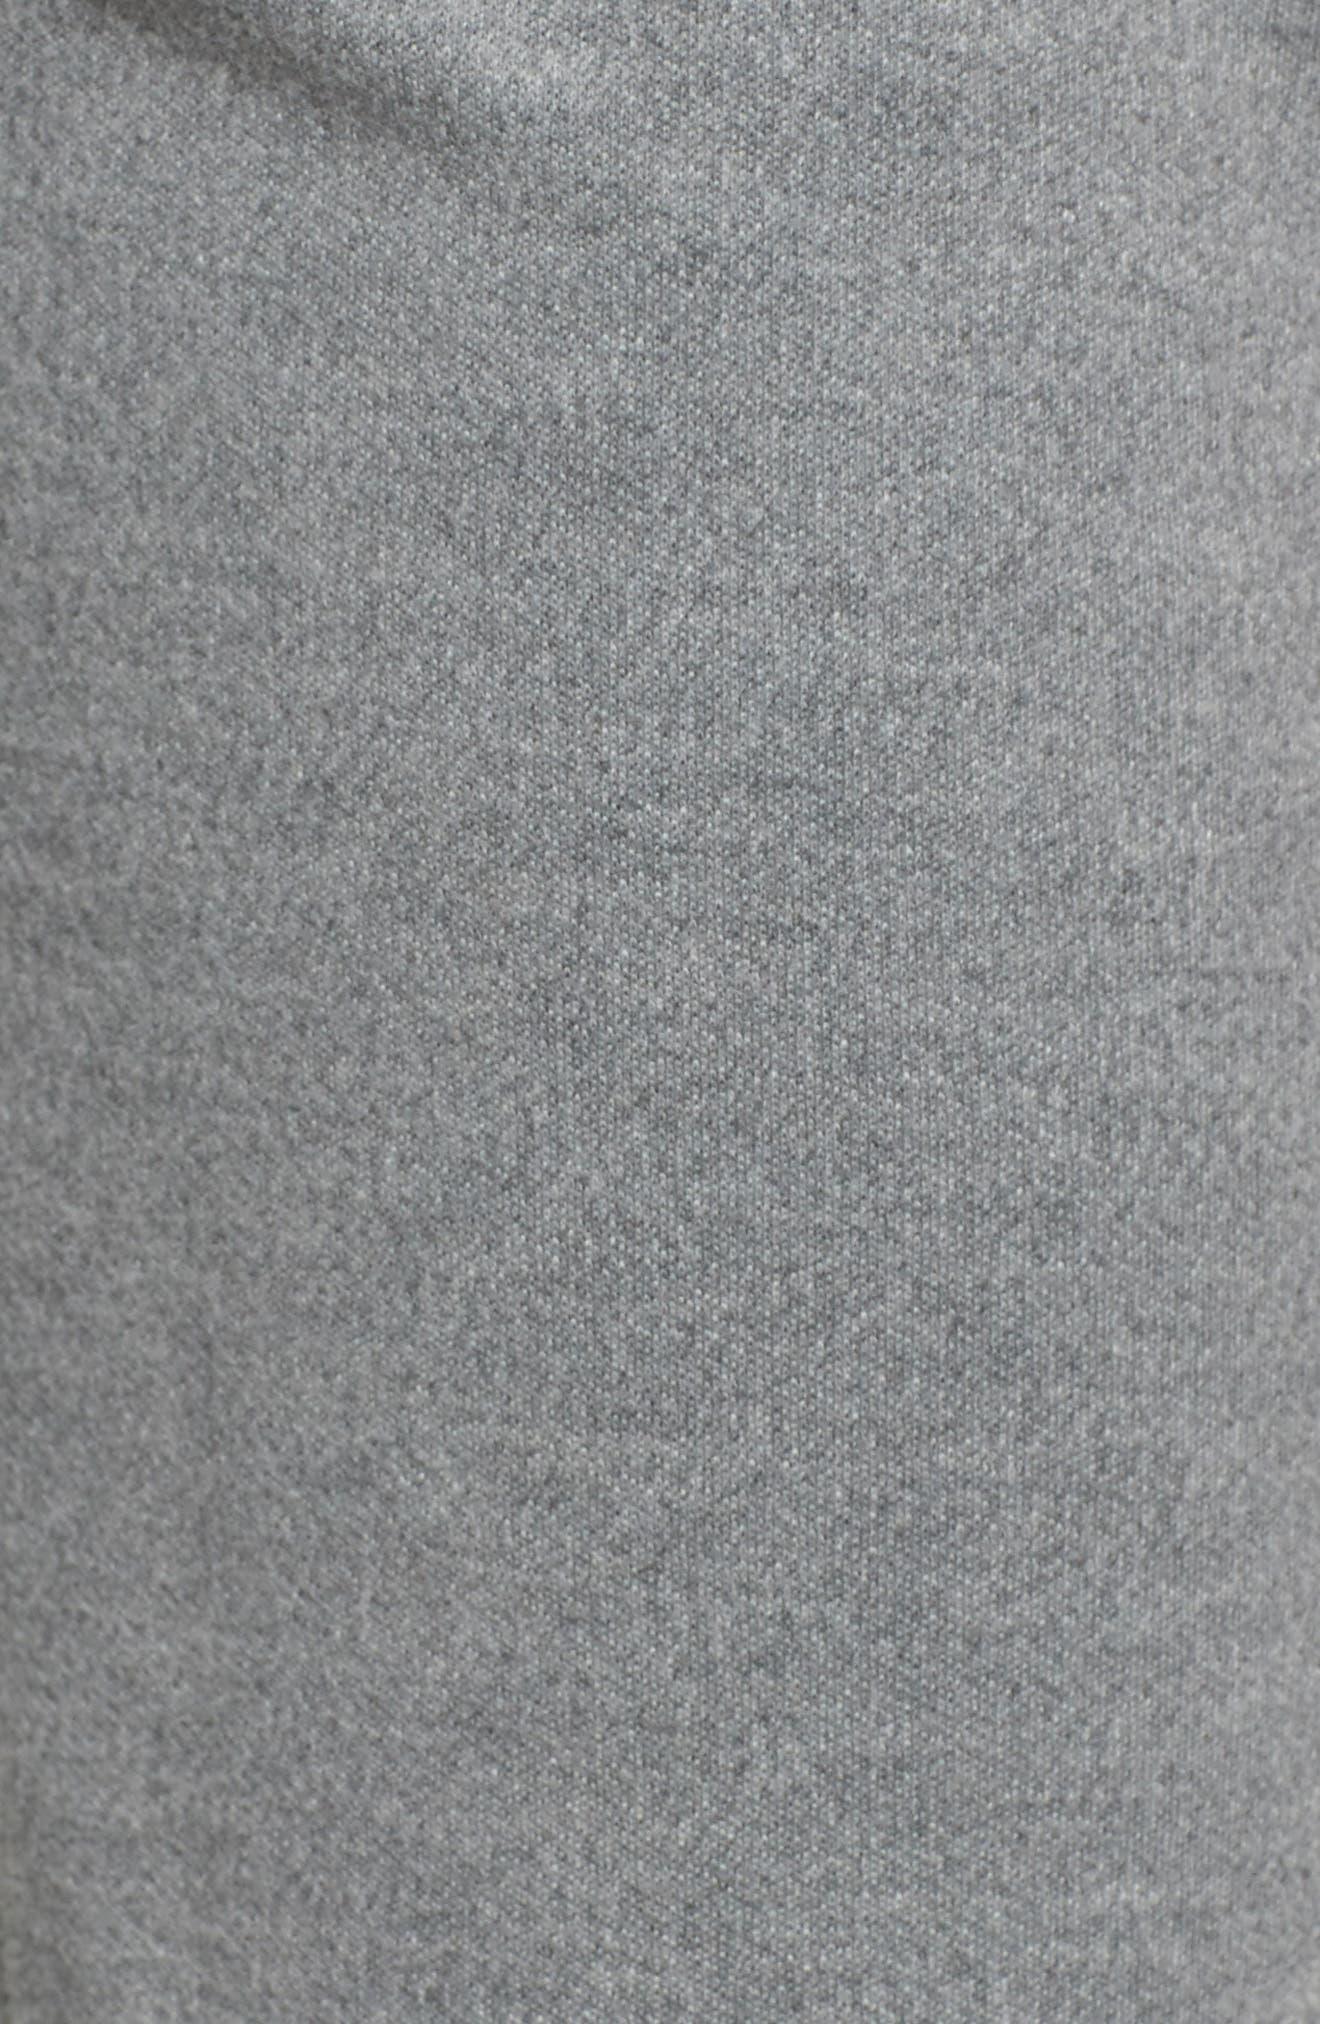 Penny Lounge Pants,                             Alternate thumbnail 7, color,                             Grey Heather